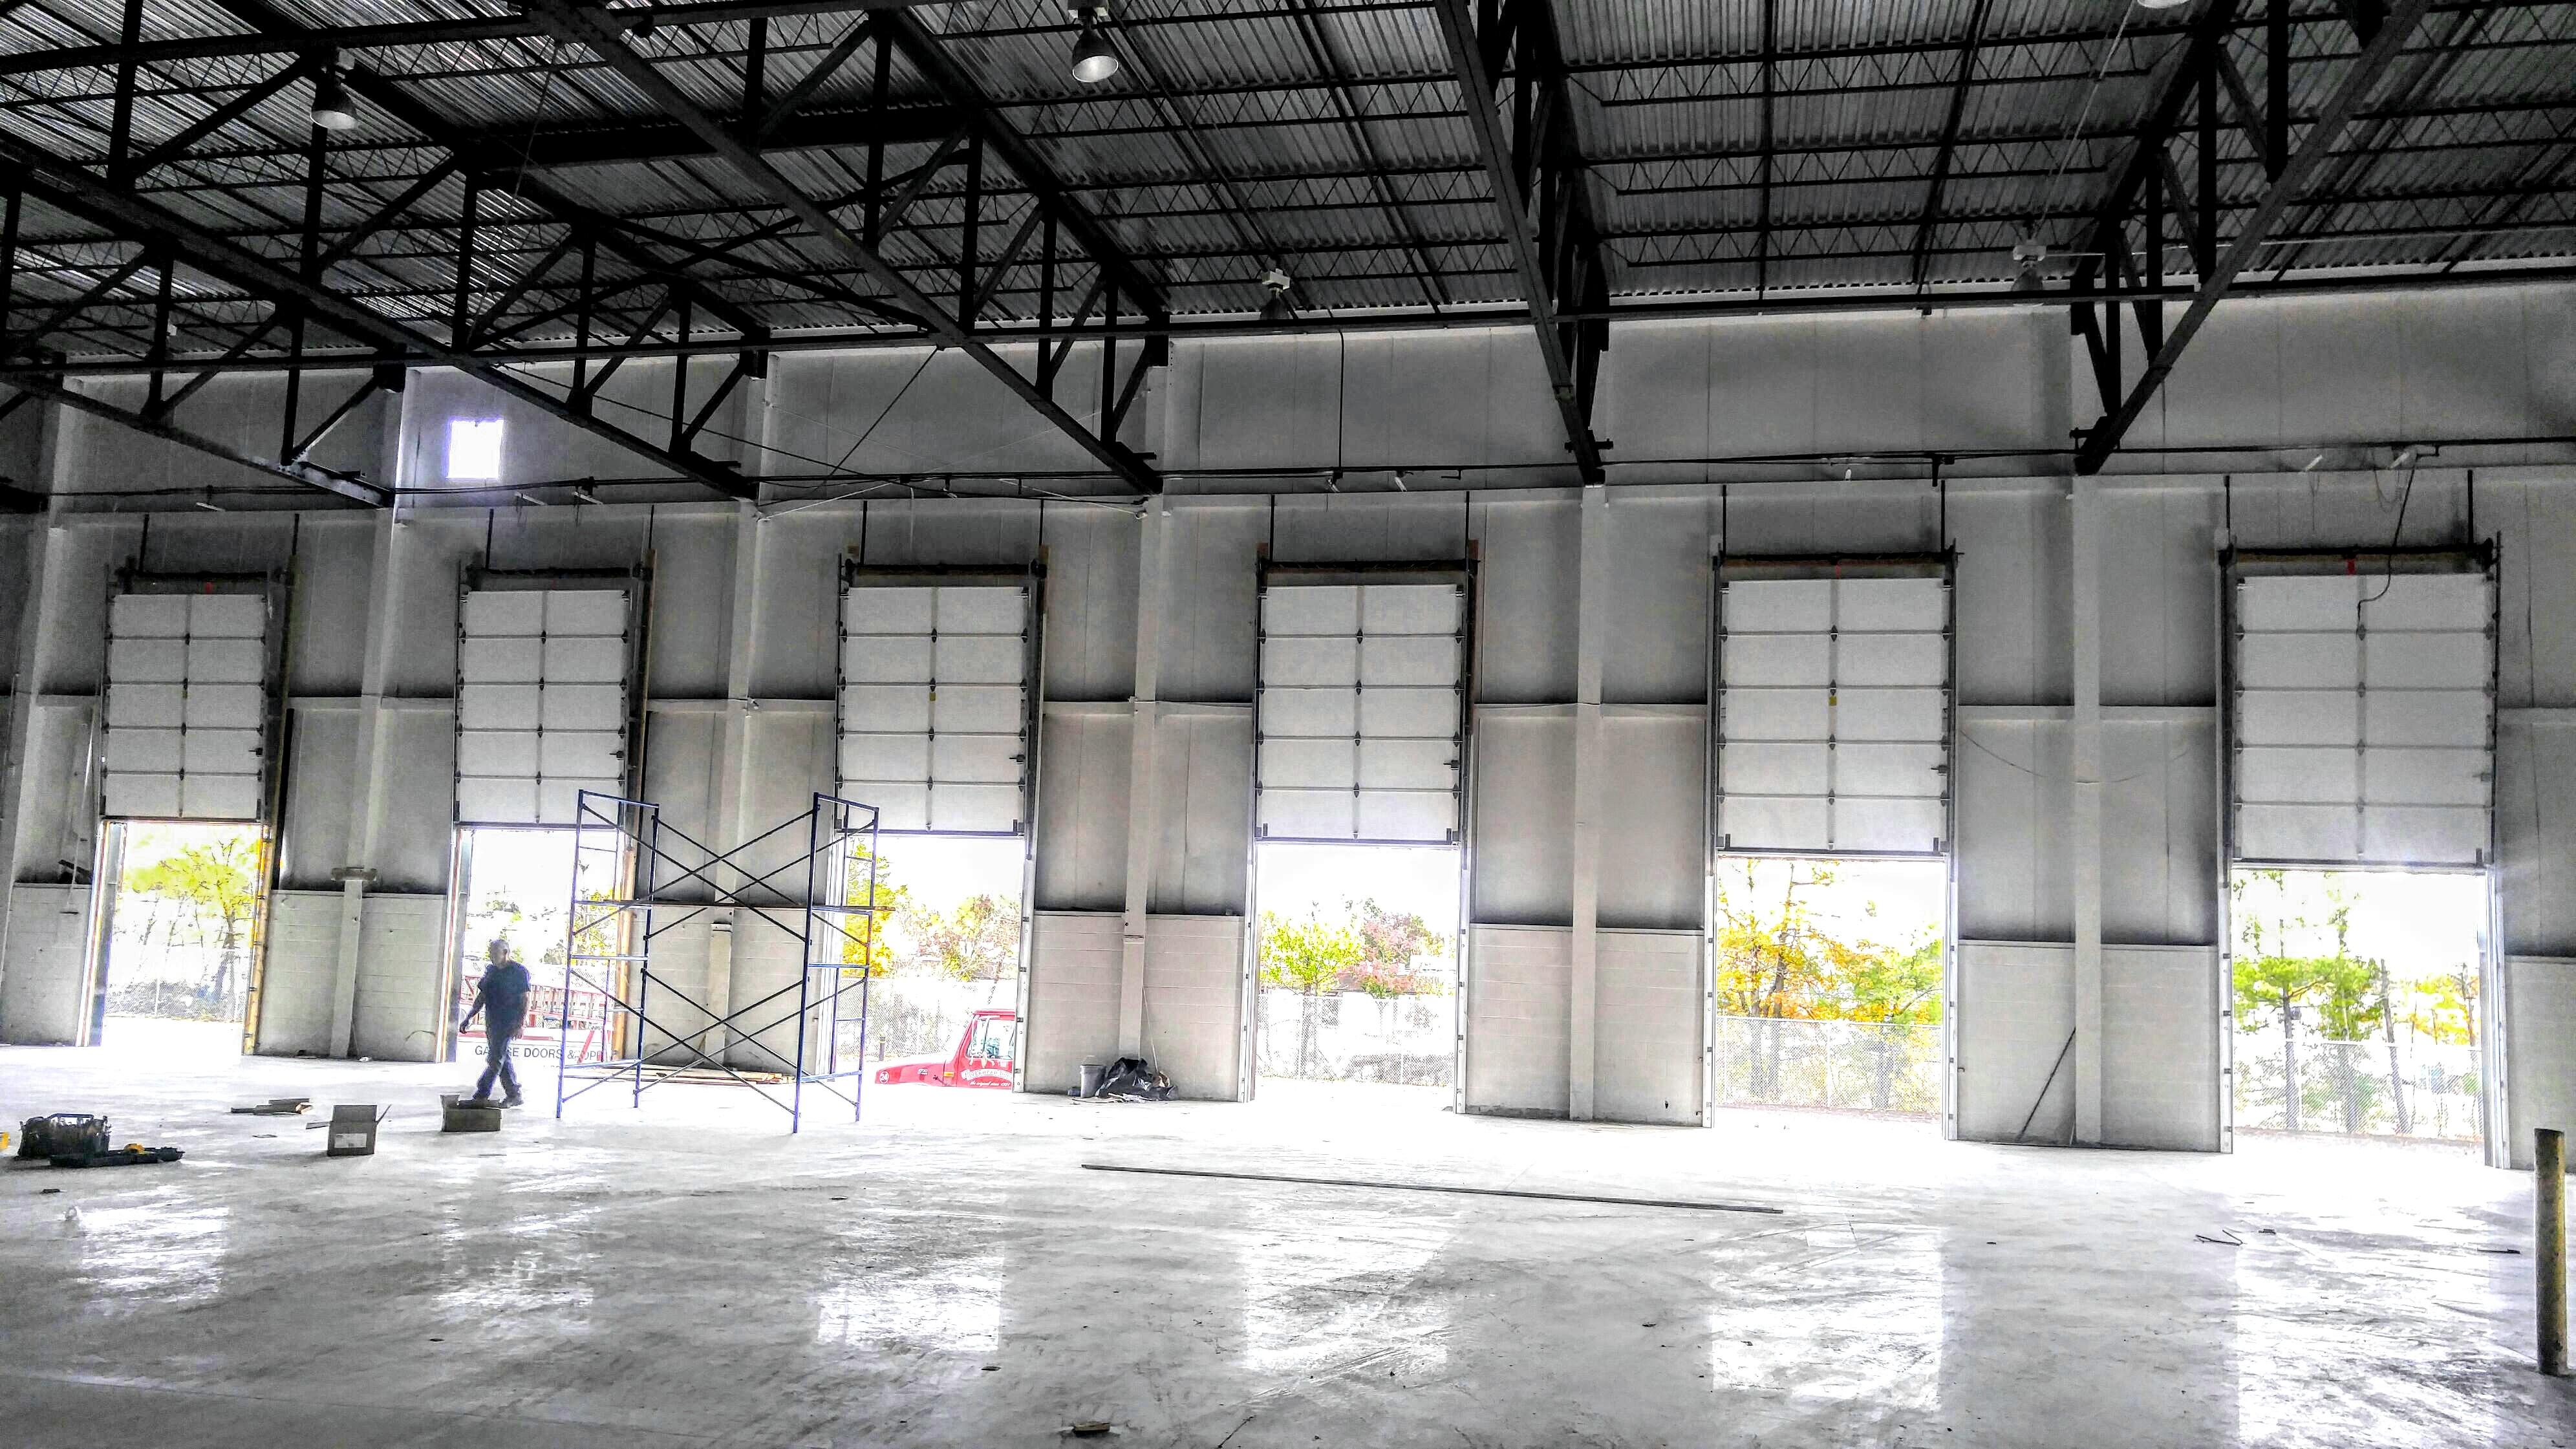 Sectional-Overhead-Doors-Distribution-Center.jpg